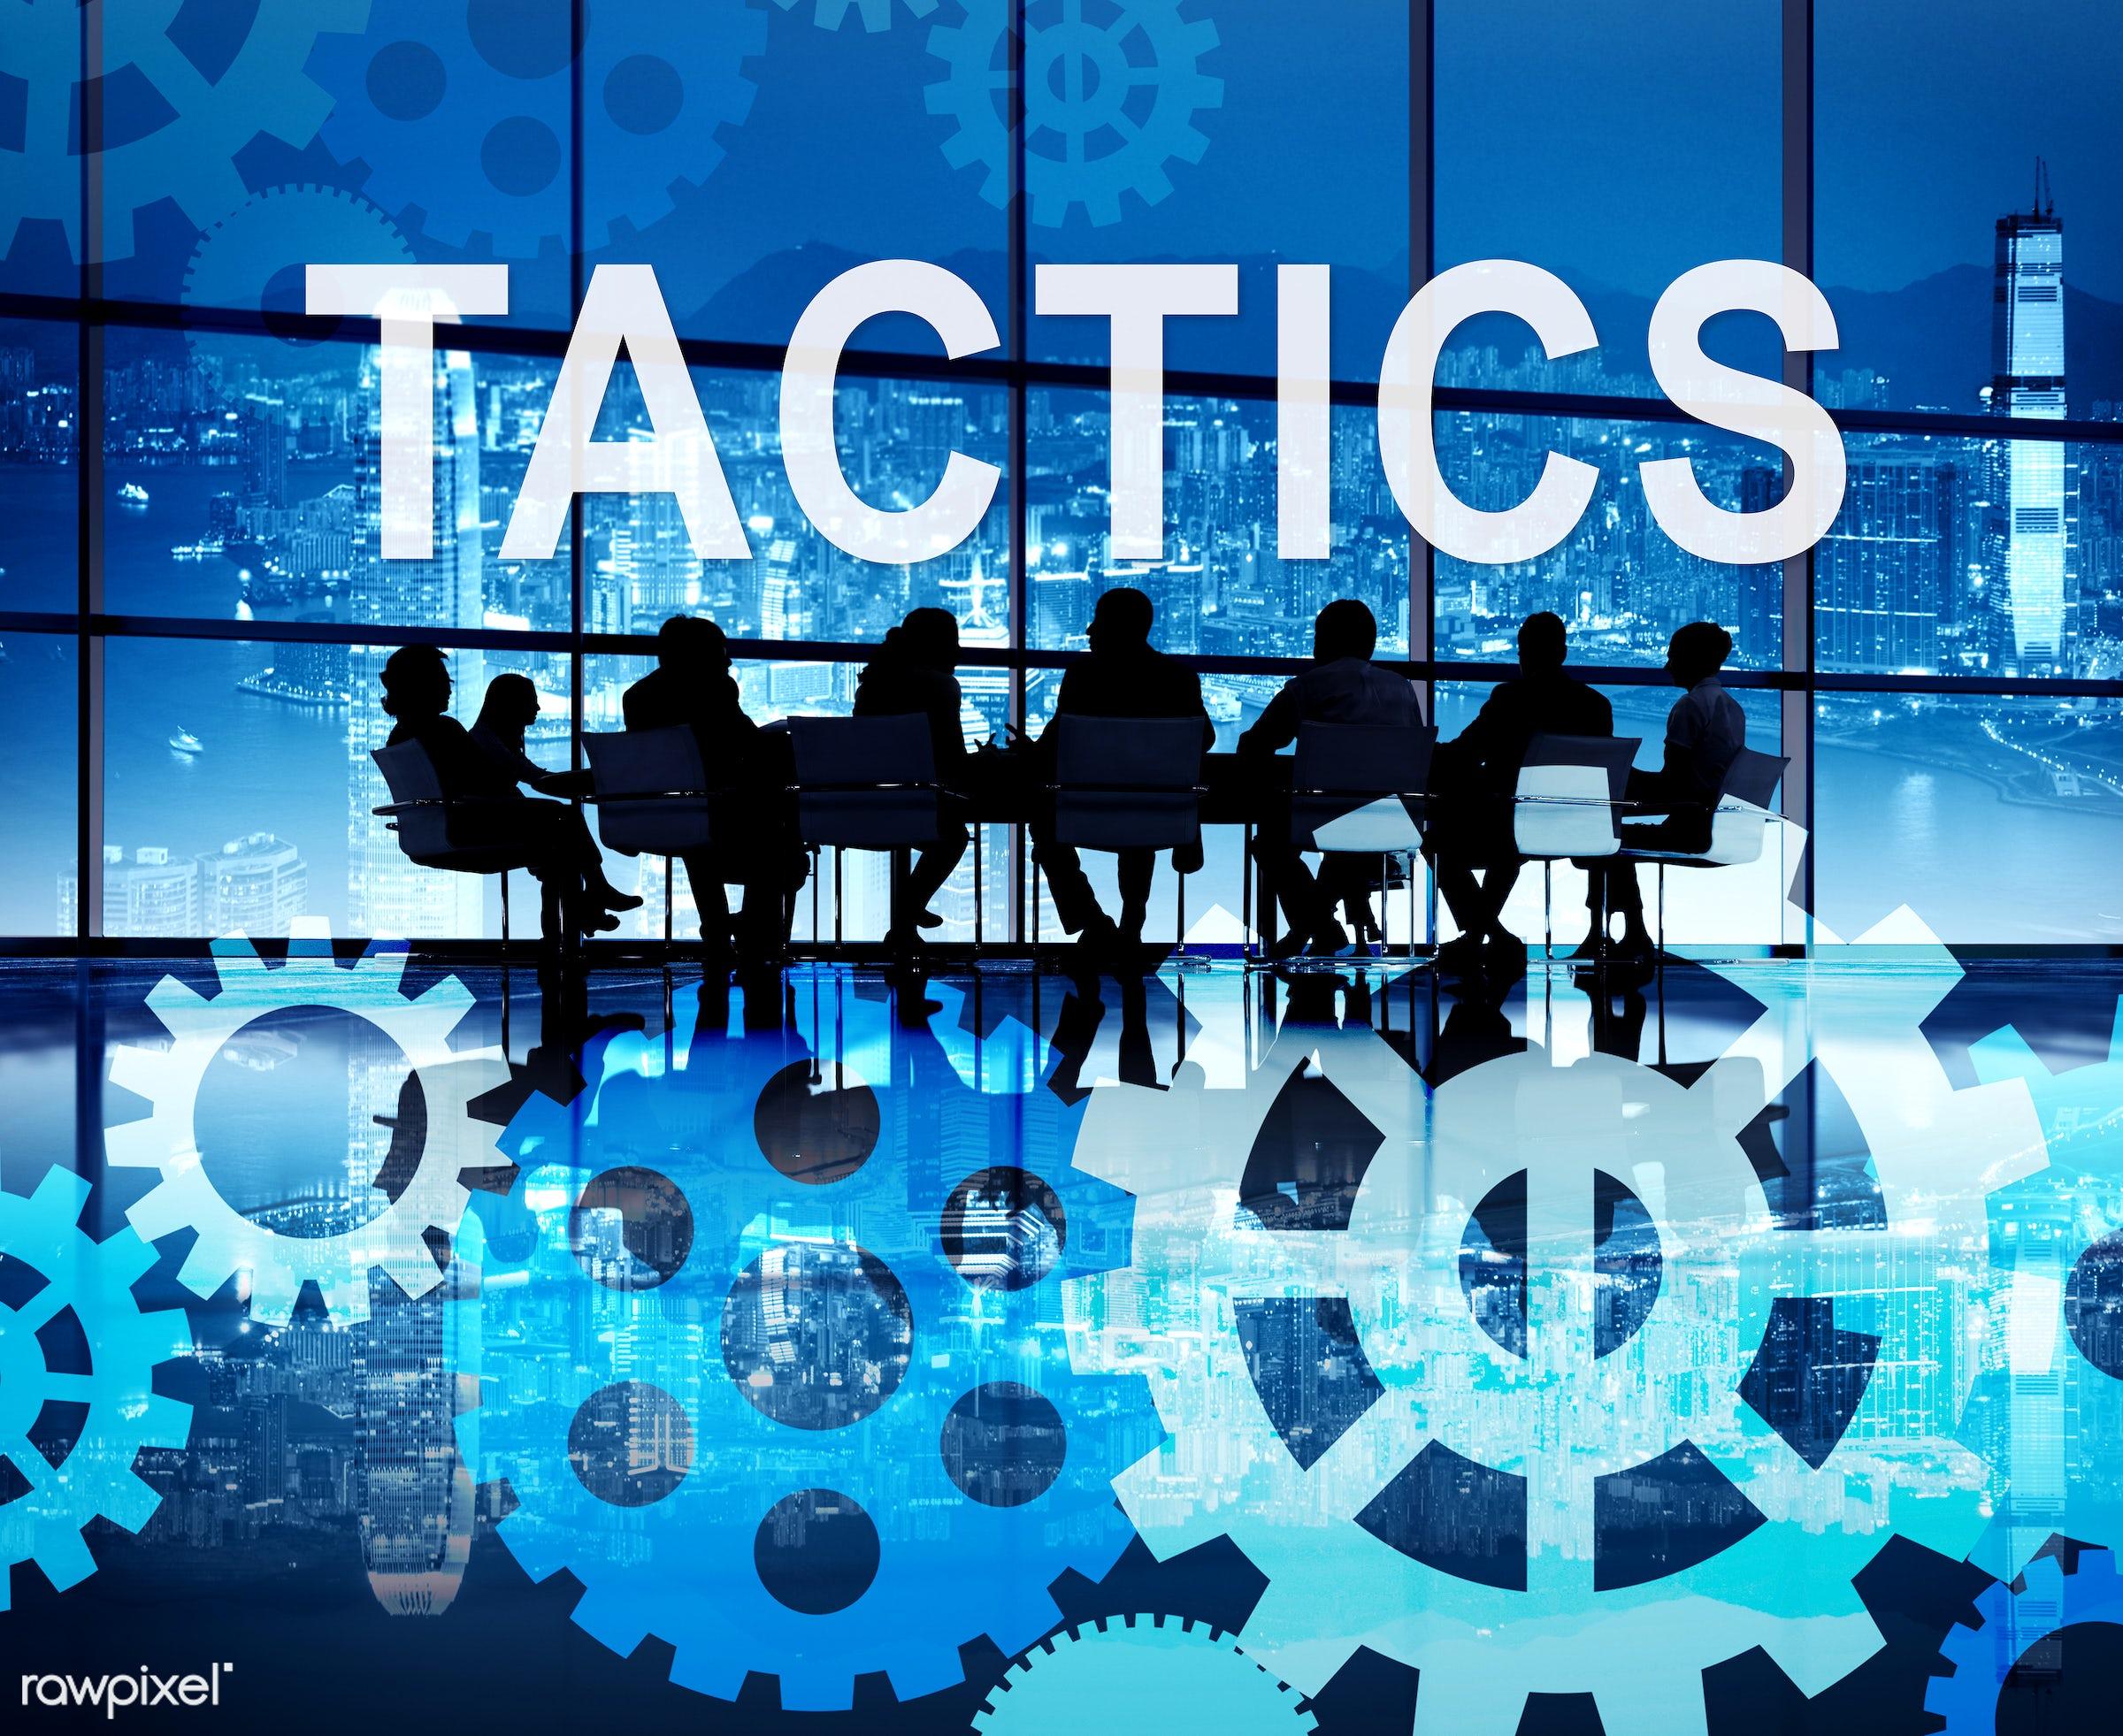 development, building, business, business people, businessmen, businesswomen, cityscape, communication, compass, conference...